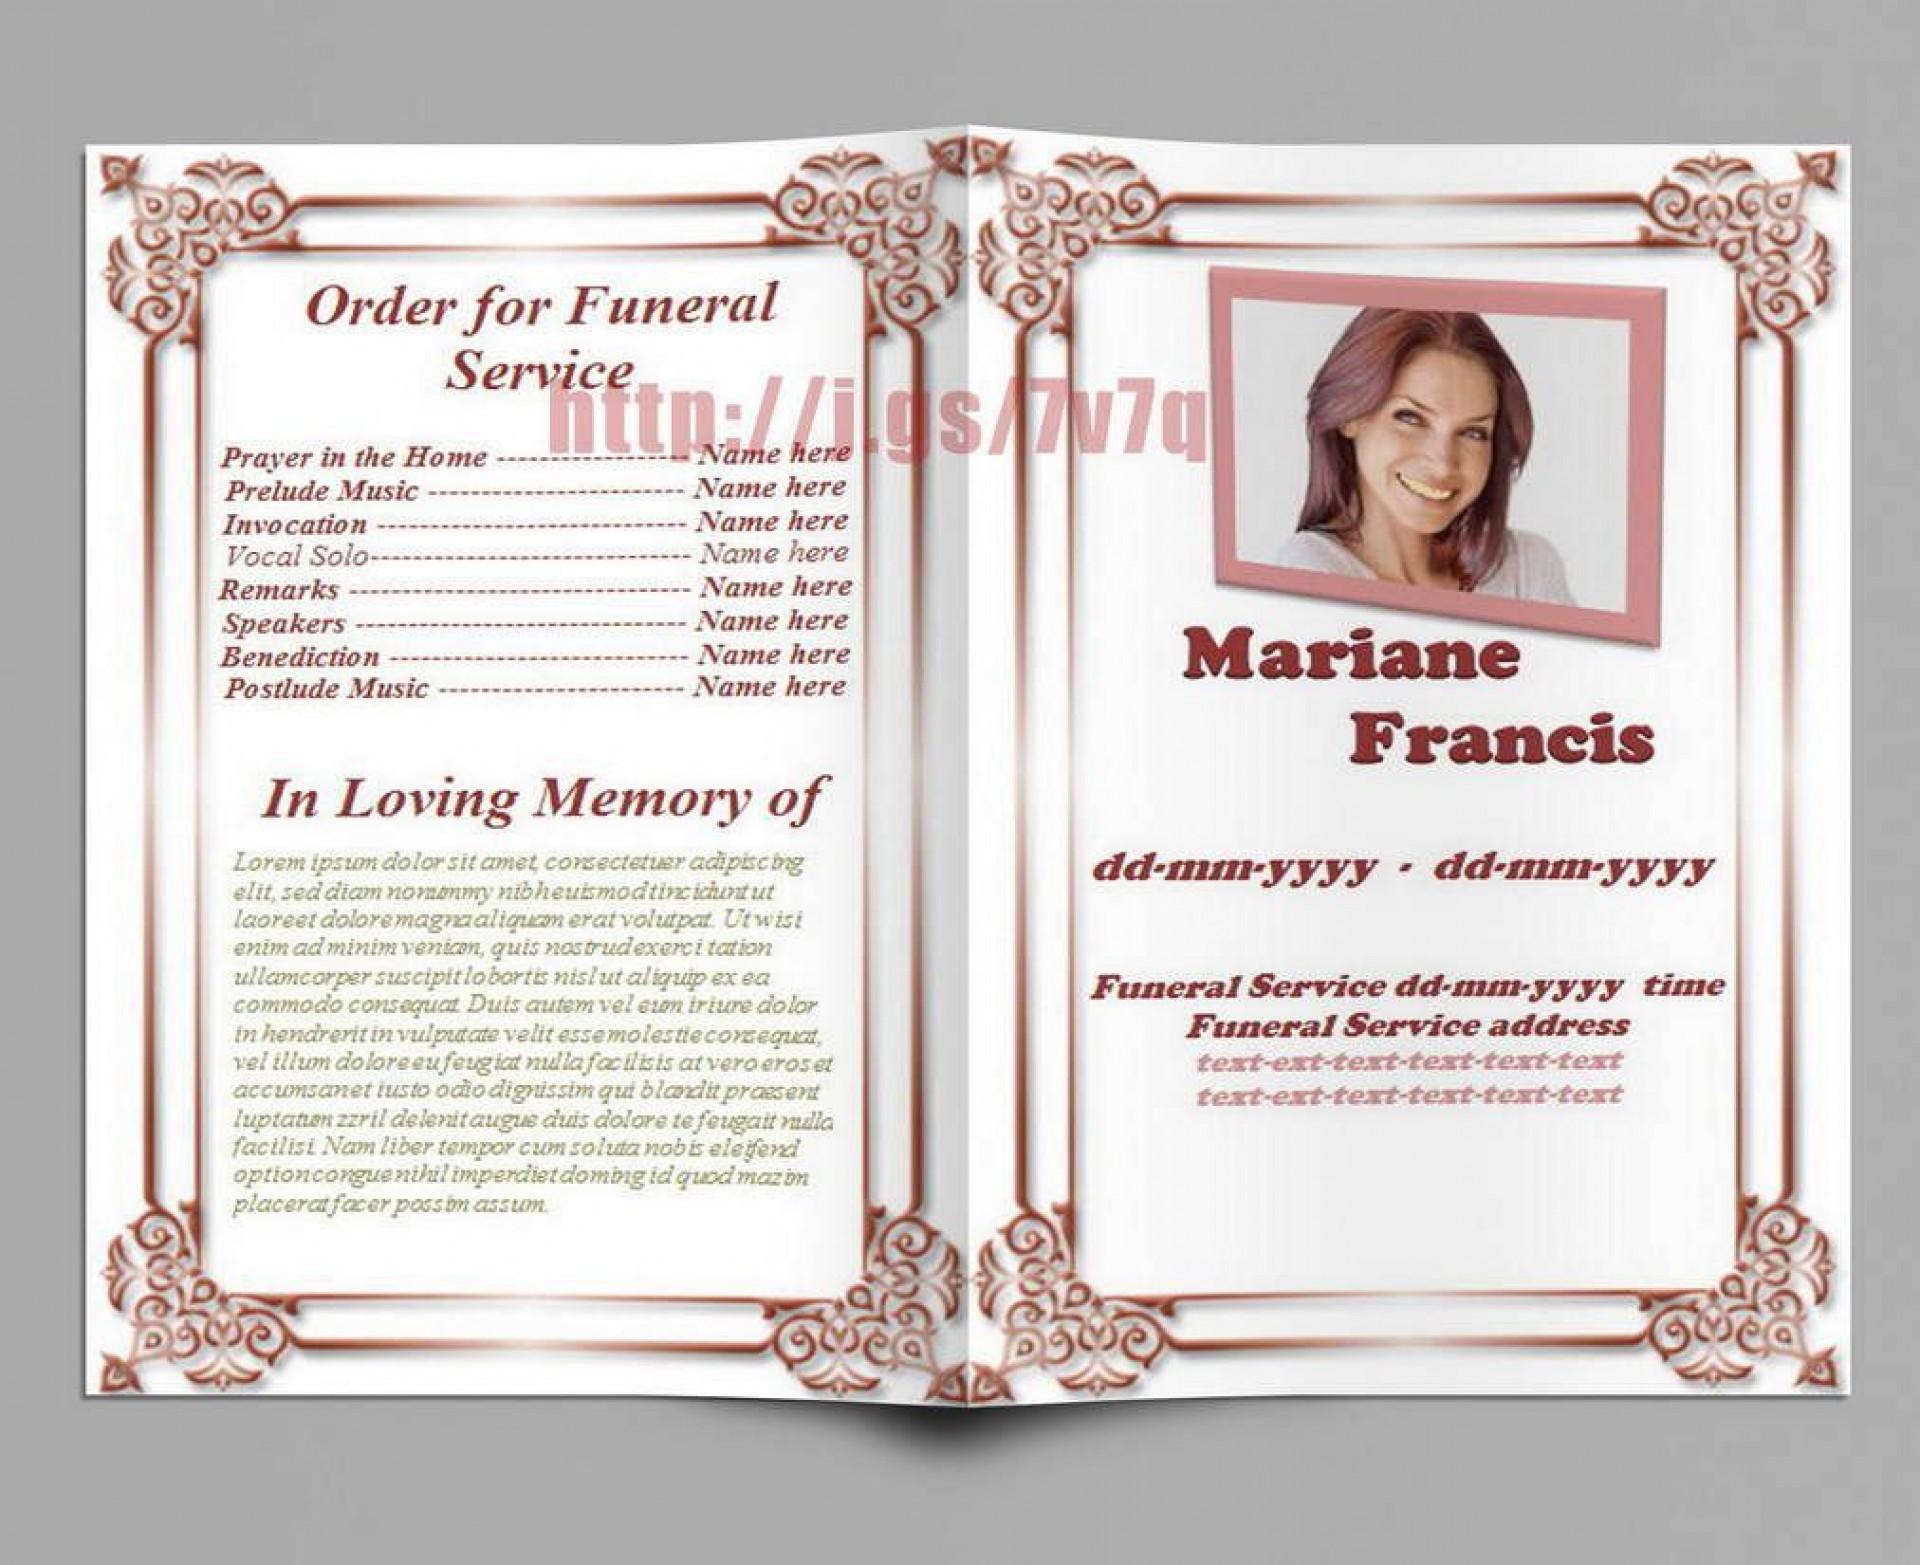 005 Breathtaking Free Funeral Program Template Download Photo  2010 Downloadable Editable Pdf Blank1920